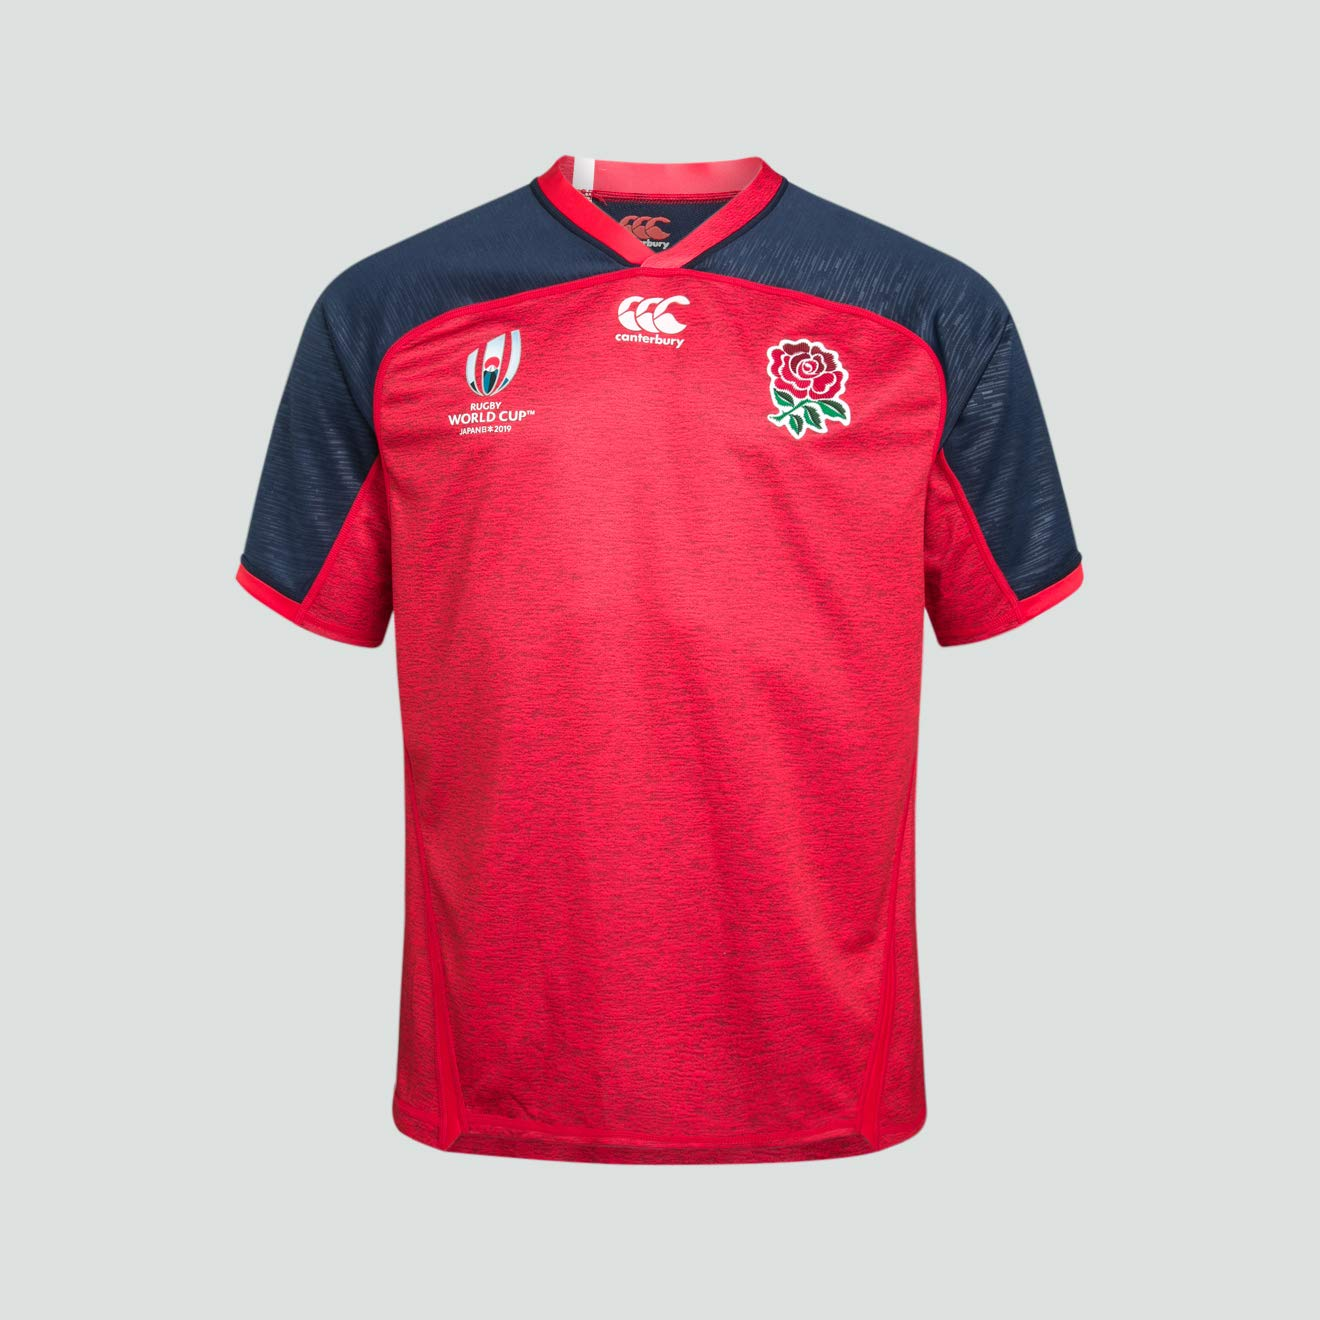 Canterbury 2019 - Camiseta de Manga Larga de Rugby de Inglaterra ...